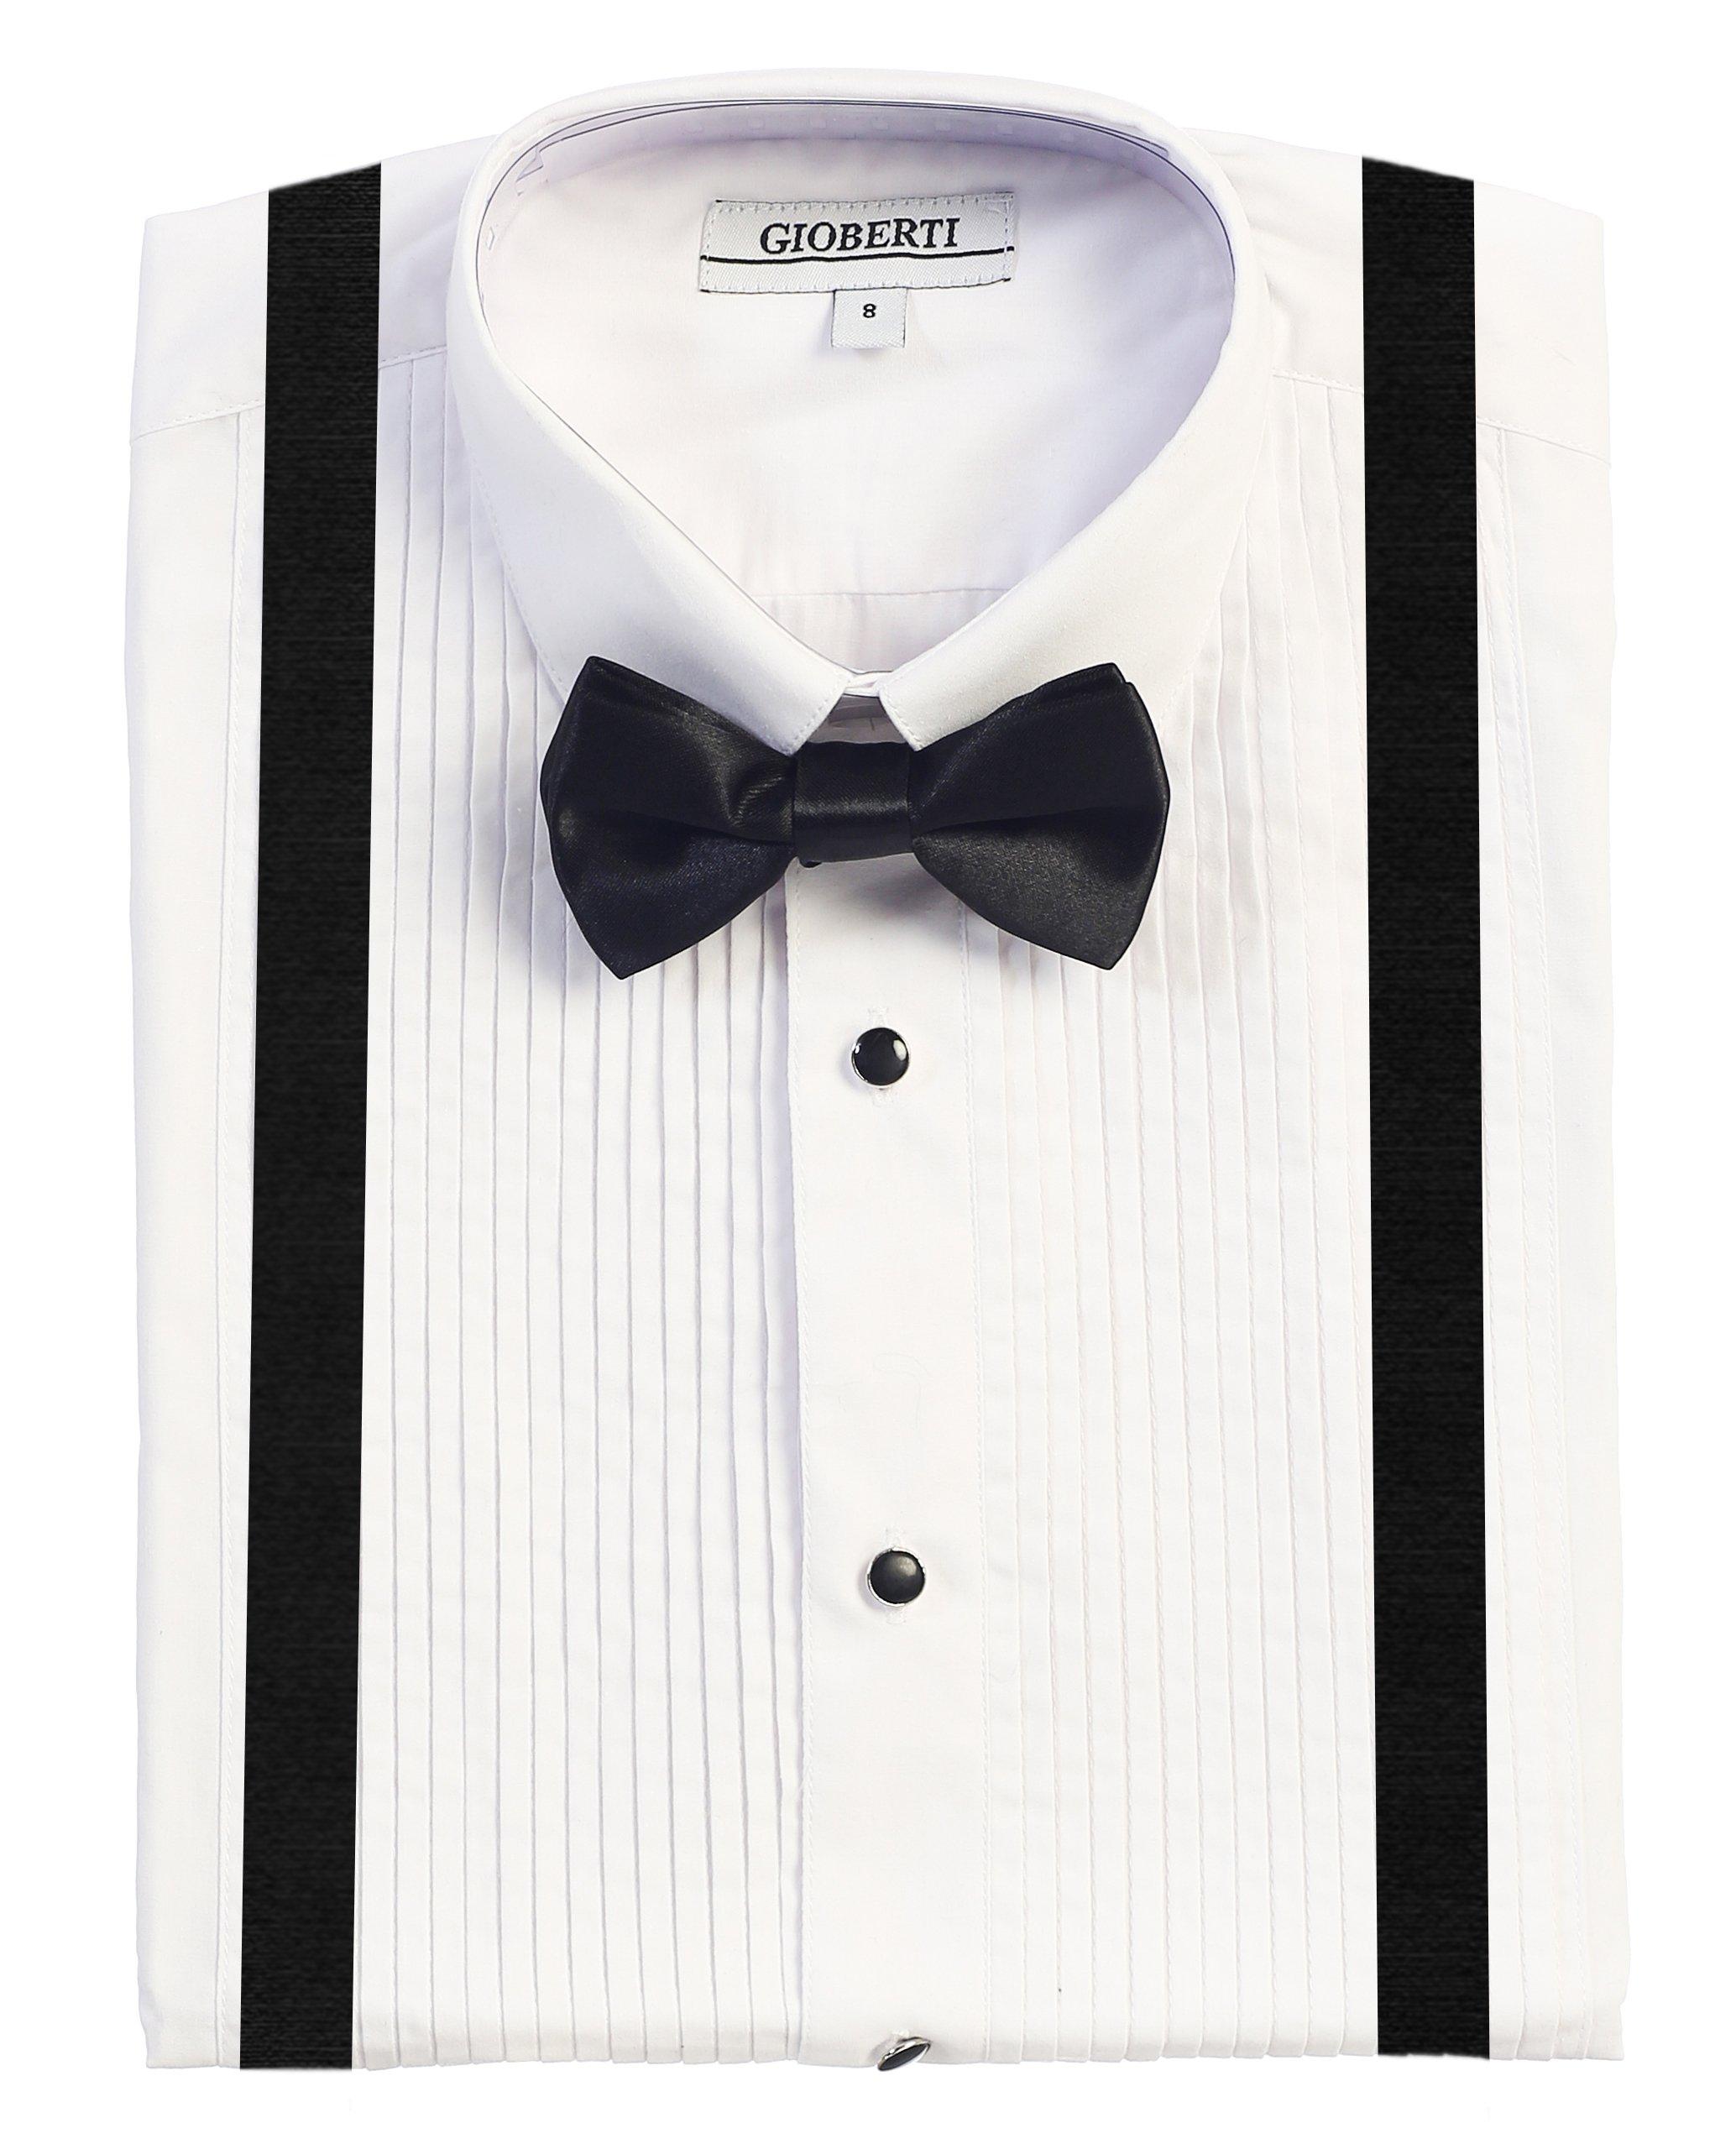 Gioberti Boy's Tuxedo Dress Shirt with Bow Tie & Suspenders, White, Size 2T